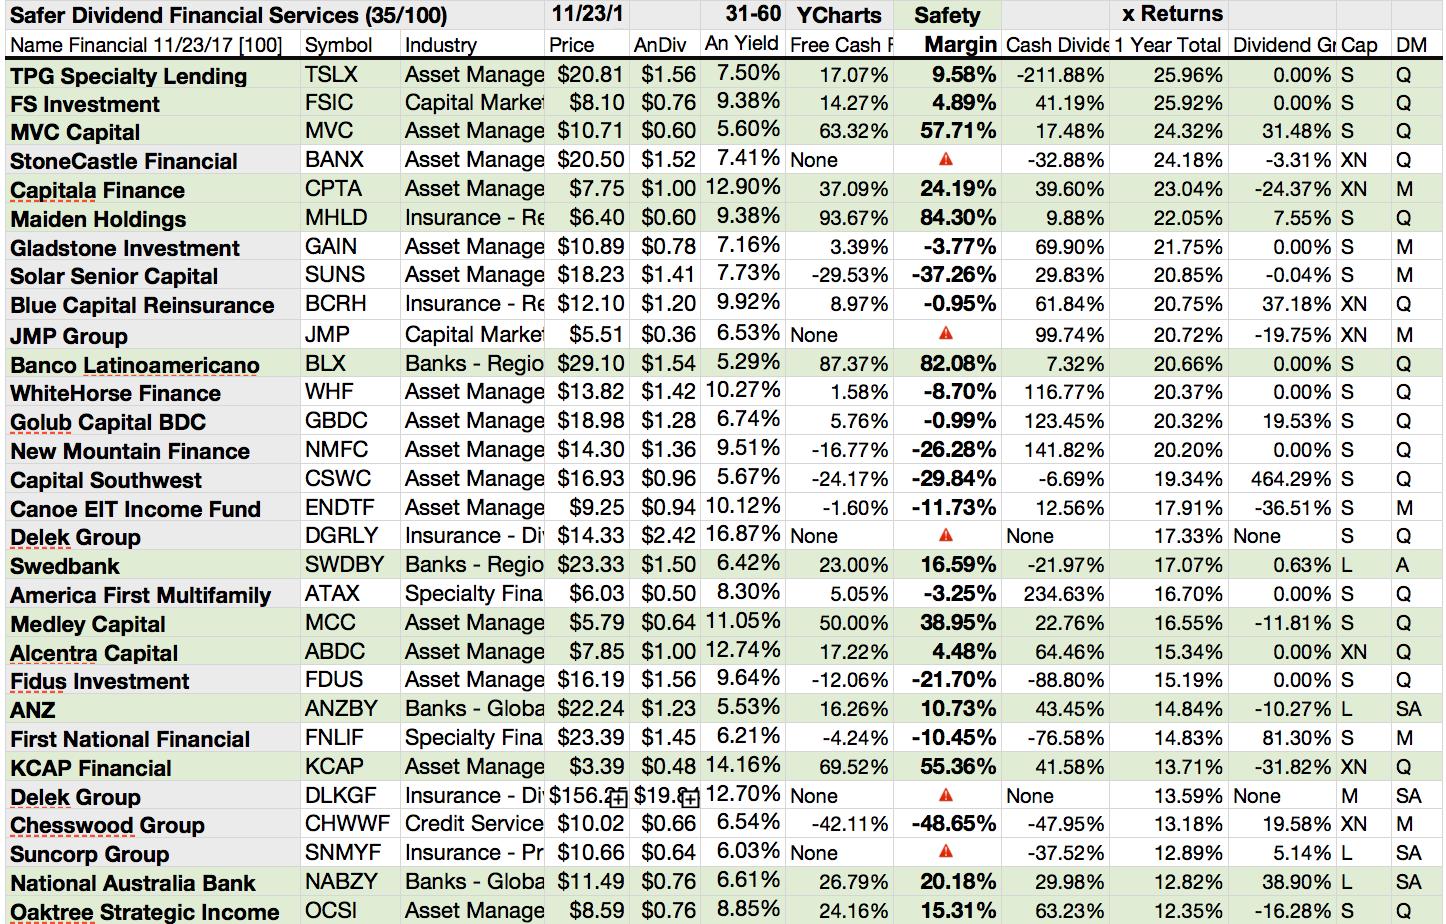 35 Of 100 Financial Services Stocks 'Safer' For Dividends ...